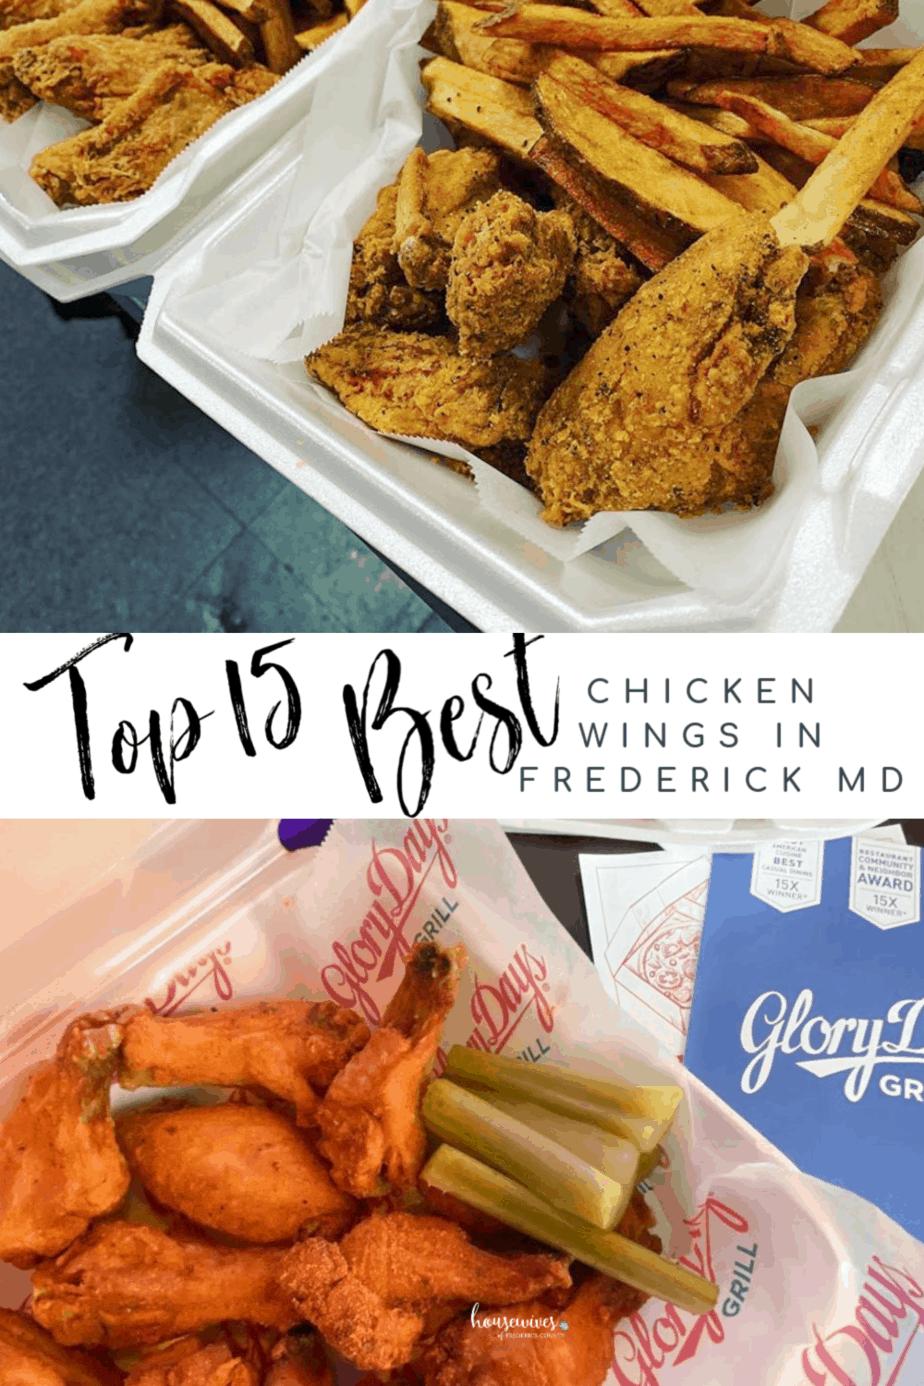 Top 15 Best Chicken Wings in Frederick Md